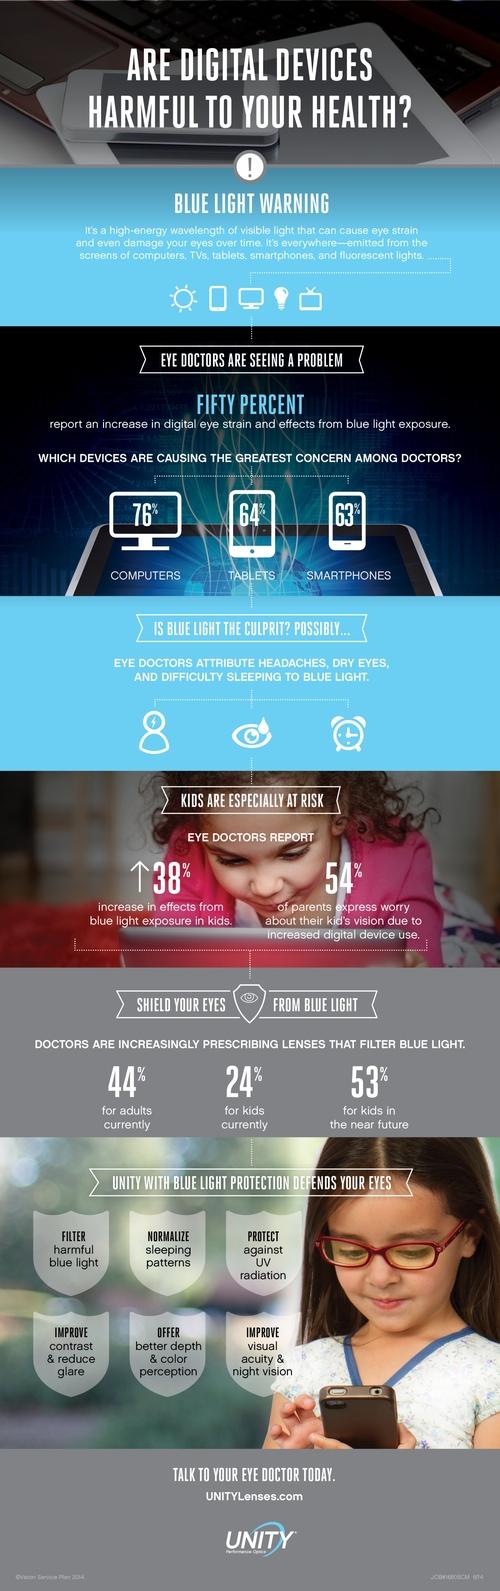 efectele luminii albastre emise de telefoane mobile